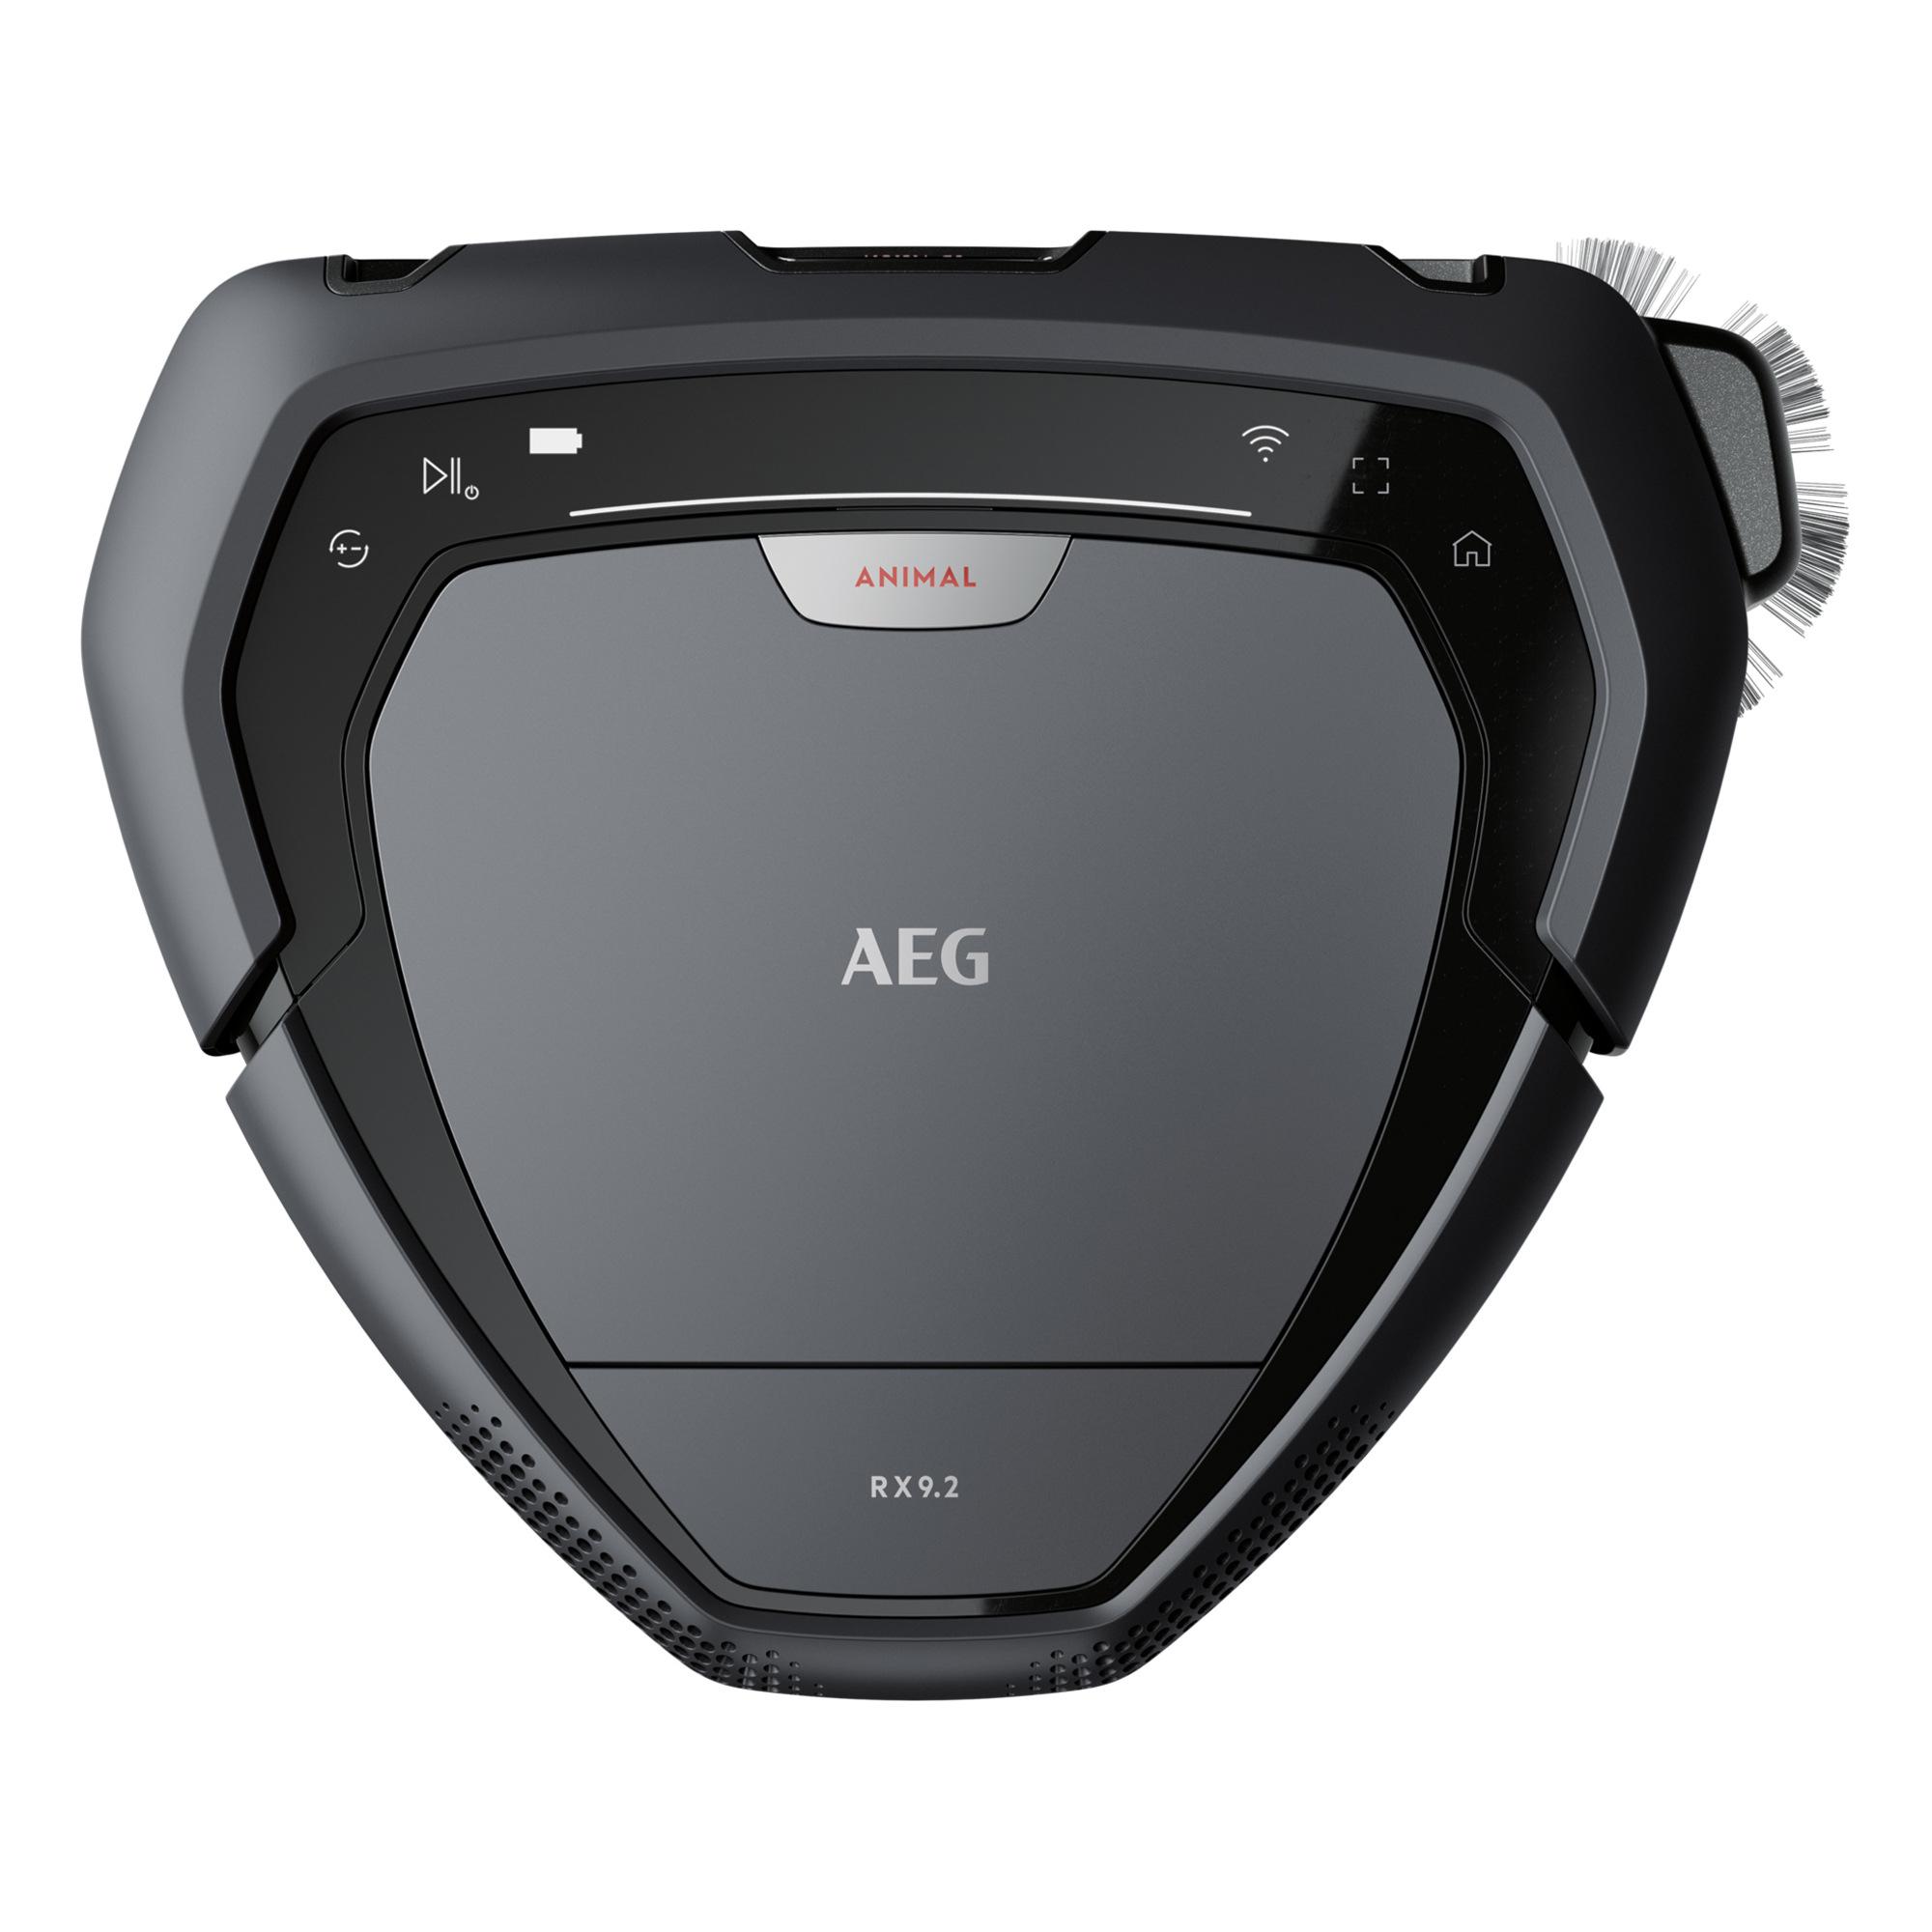 AEG Robot aspirador sin bolsa - 3 velocidades - Autonomía hasta 40min - 650 W - Depósito 0.7 L